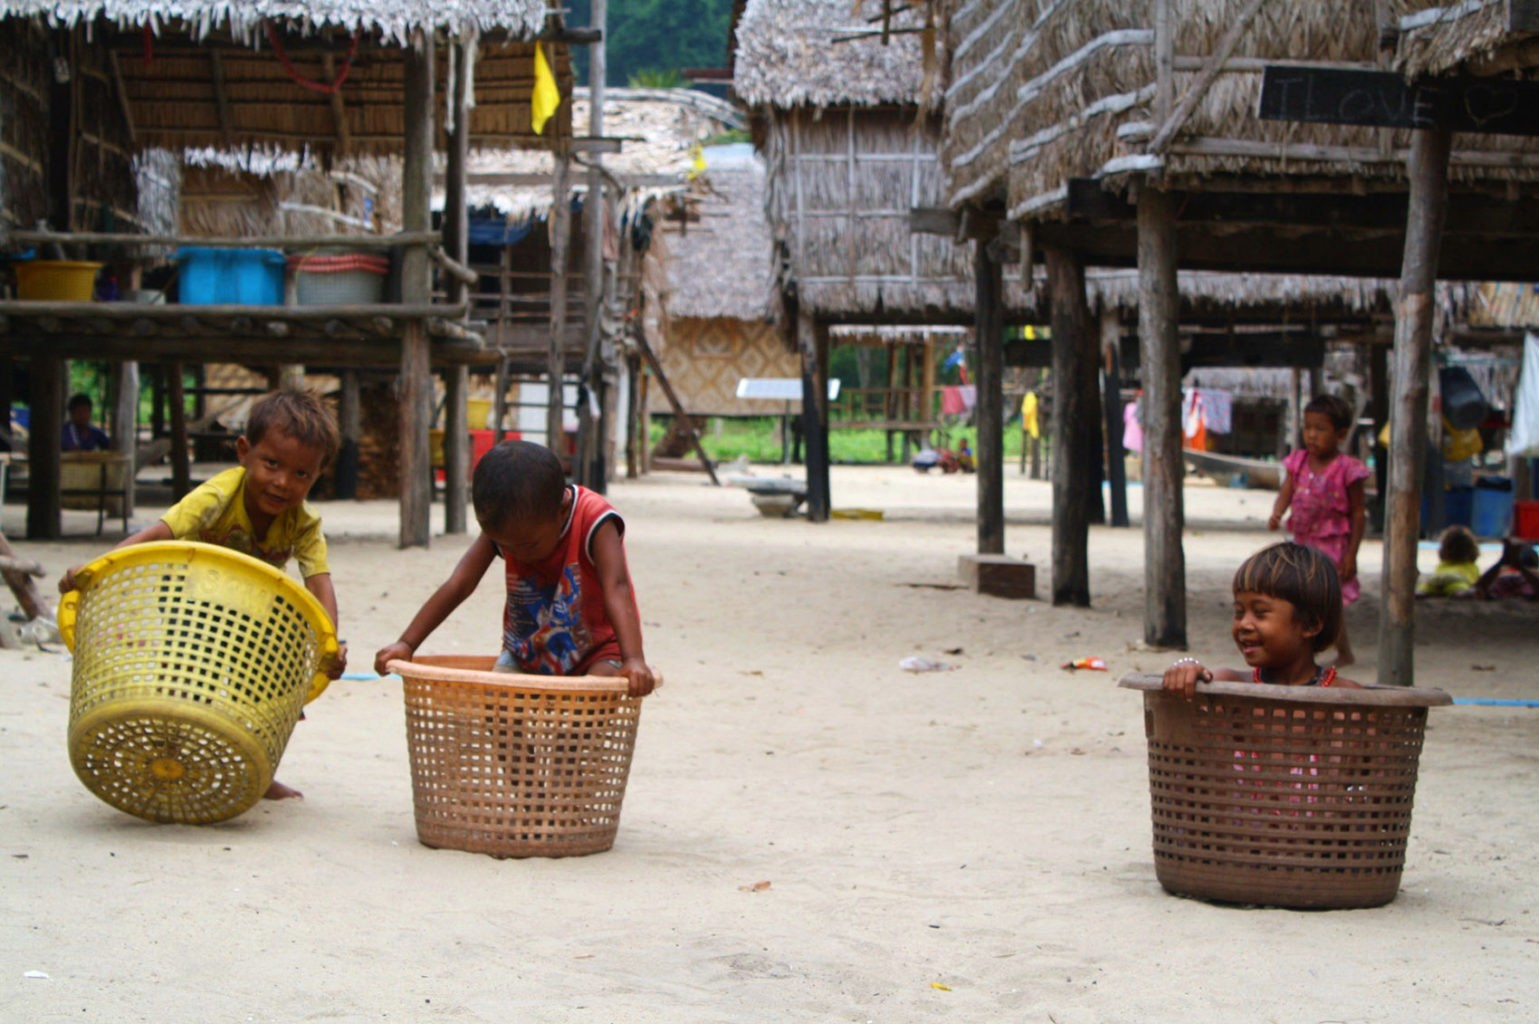 Moken Kids playing in the Village